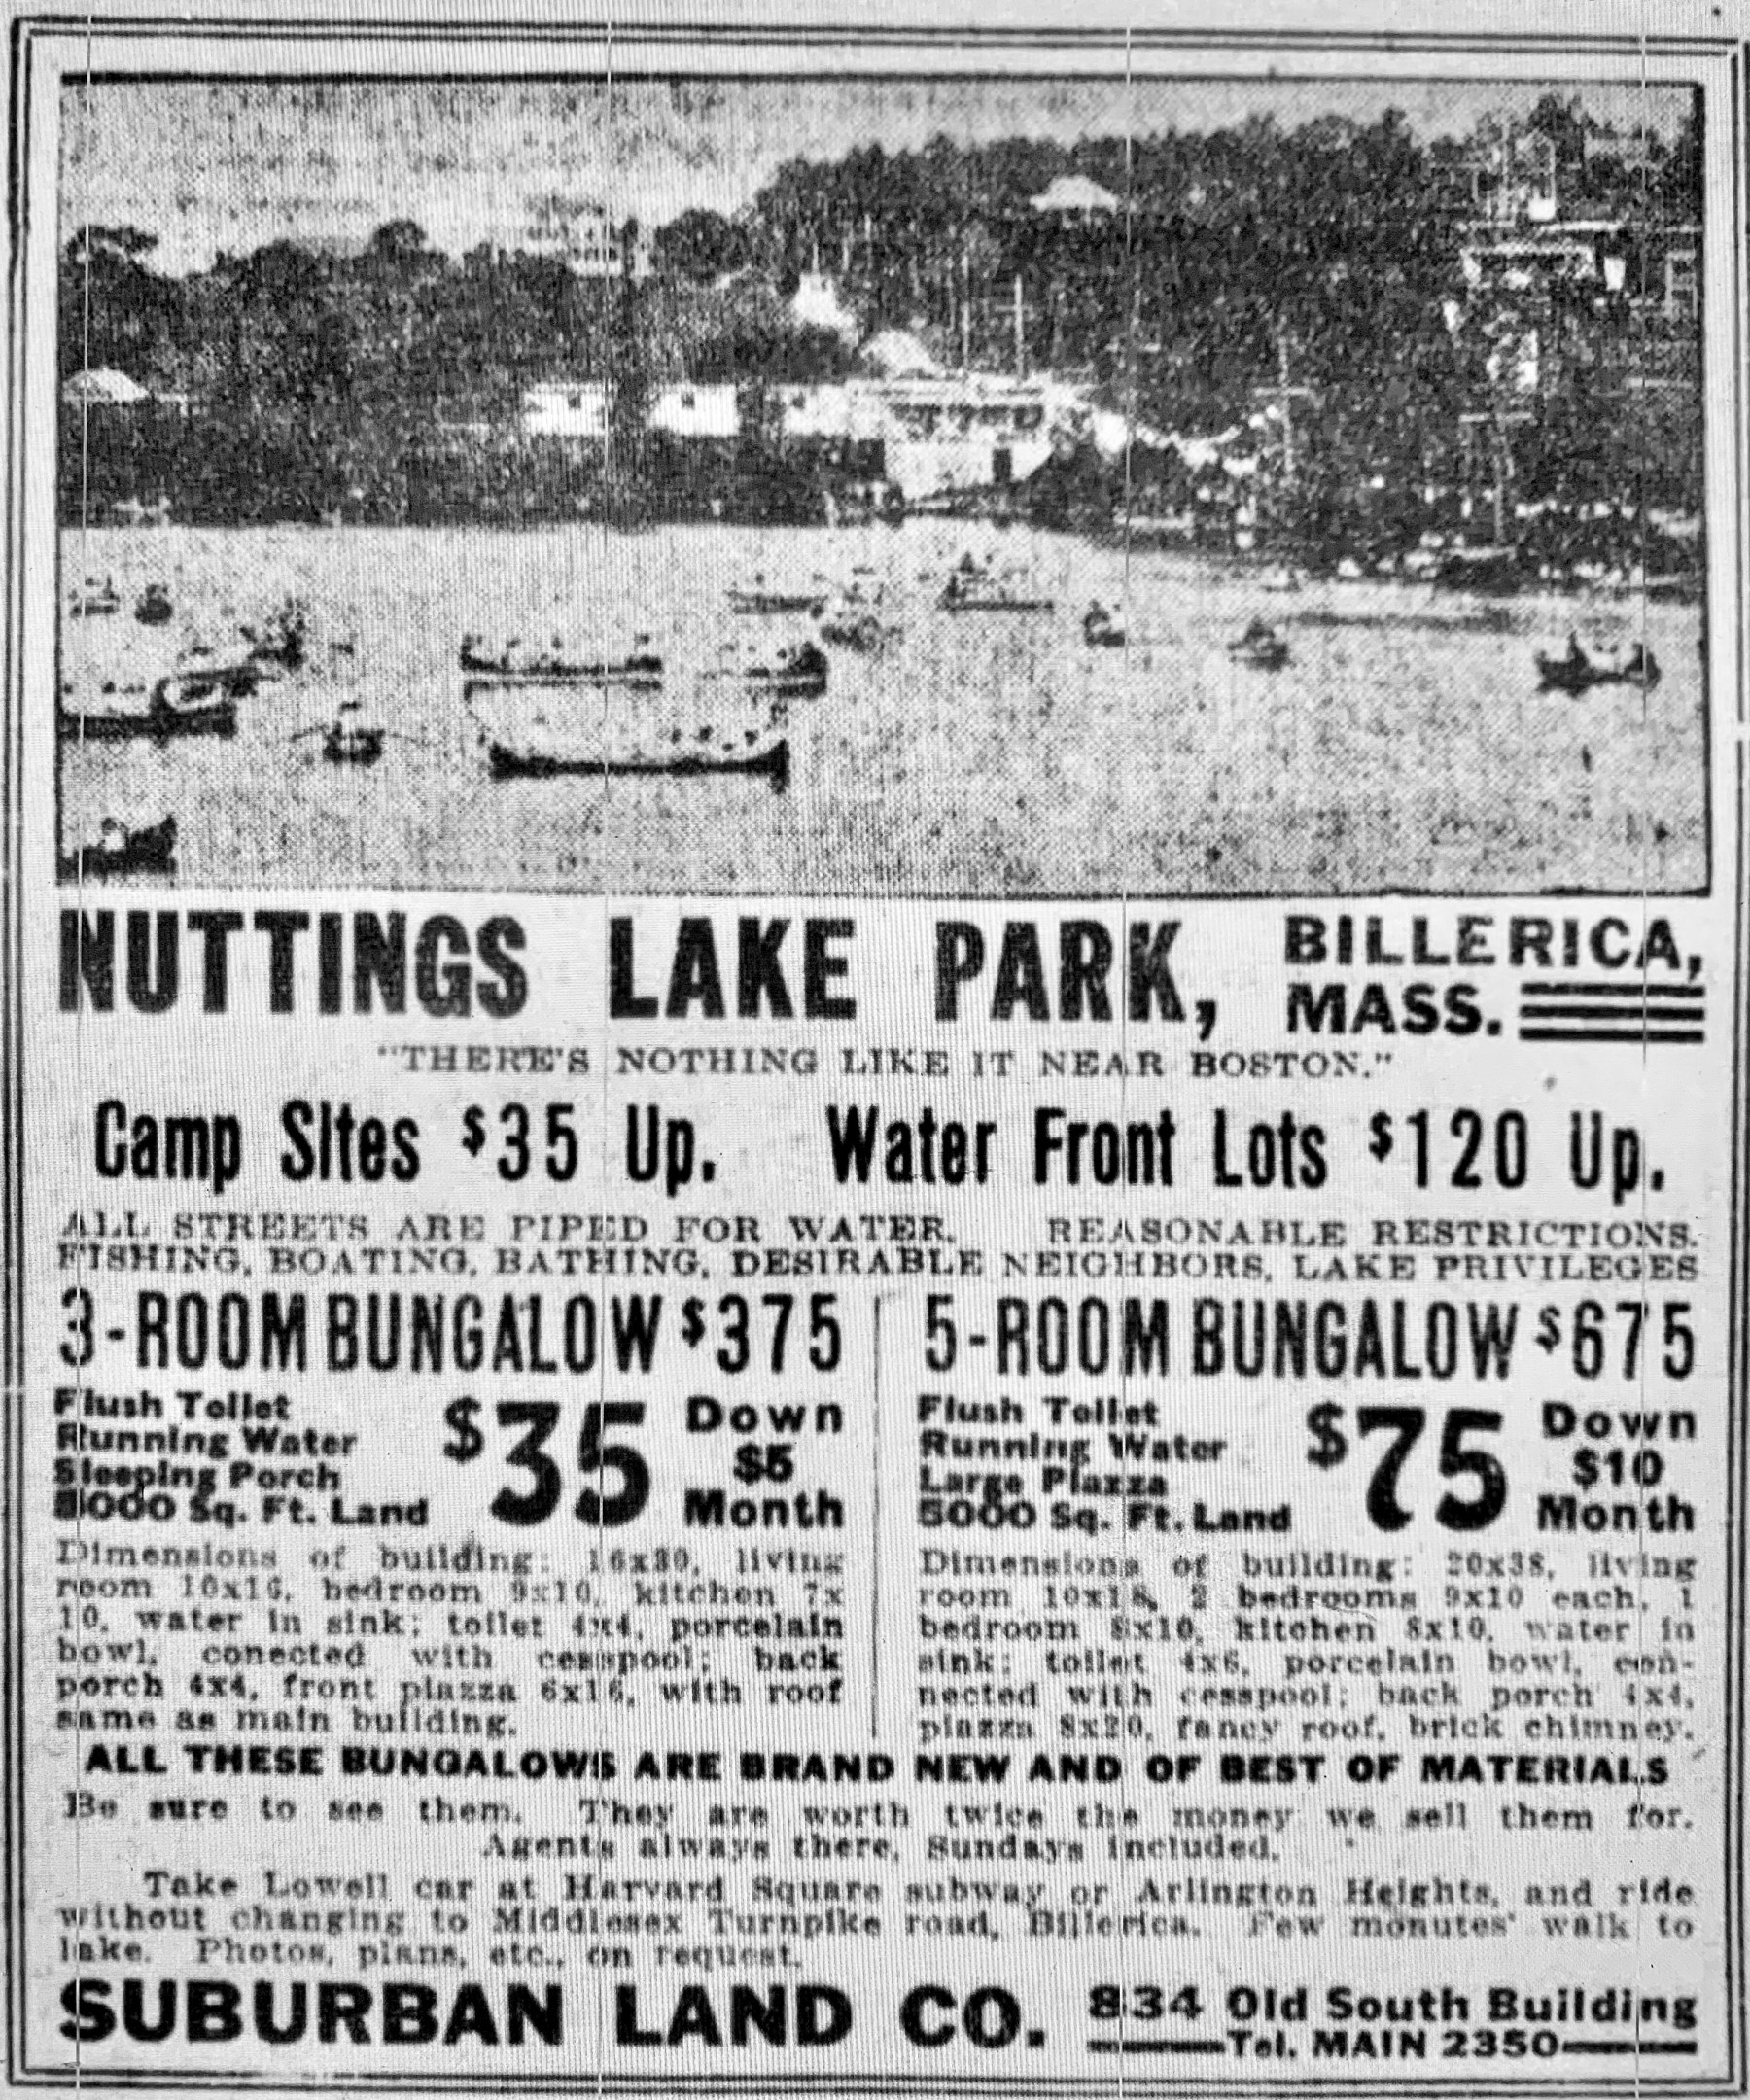 Nuttings Lake Park Billerica1917